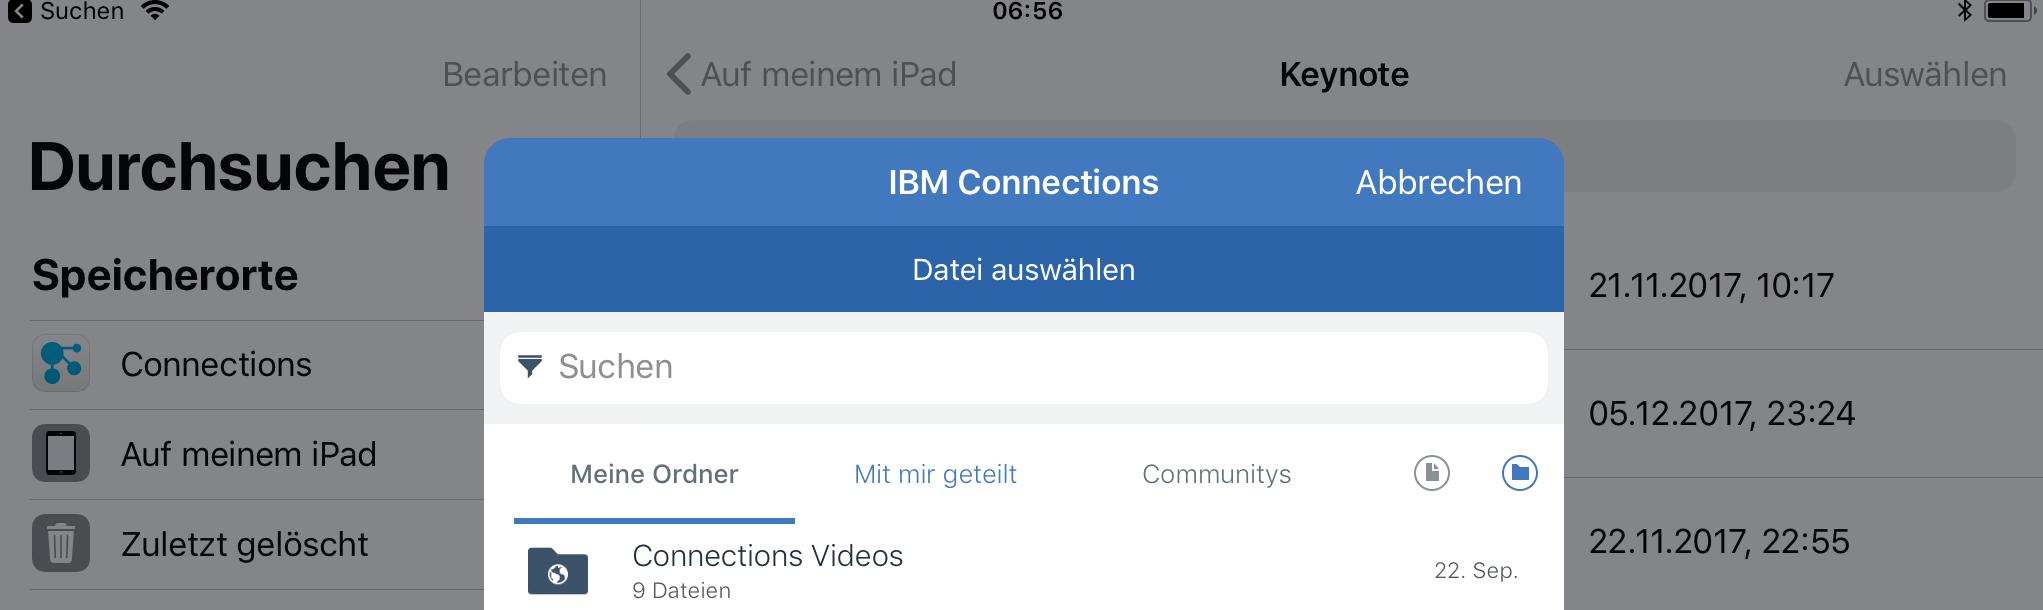 Integration in Dateien